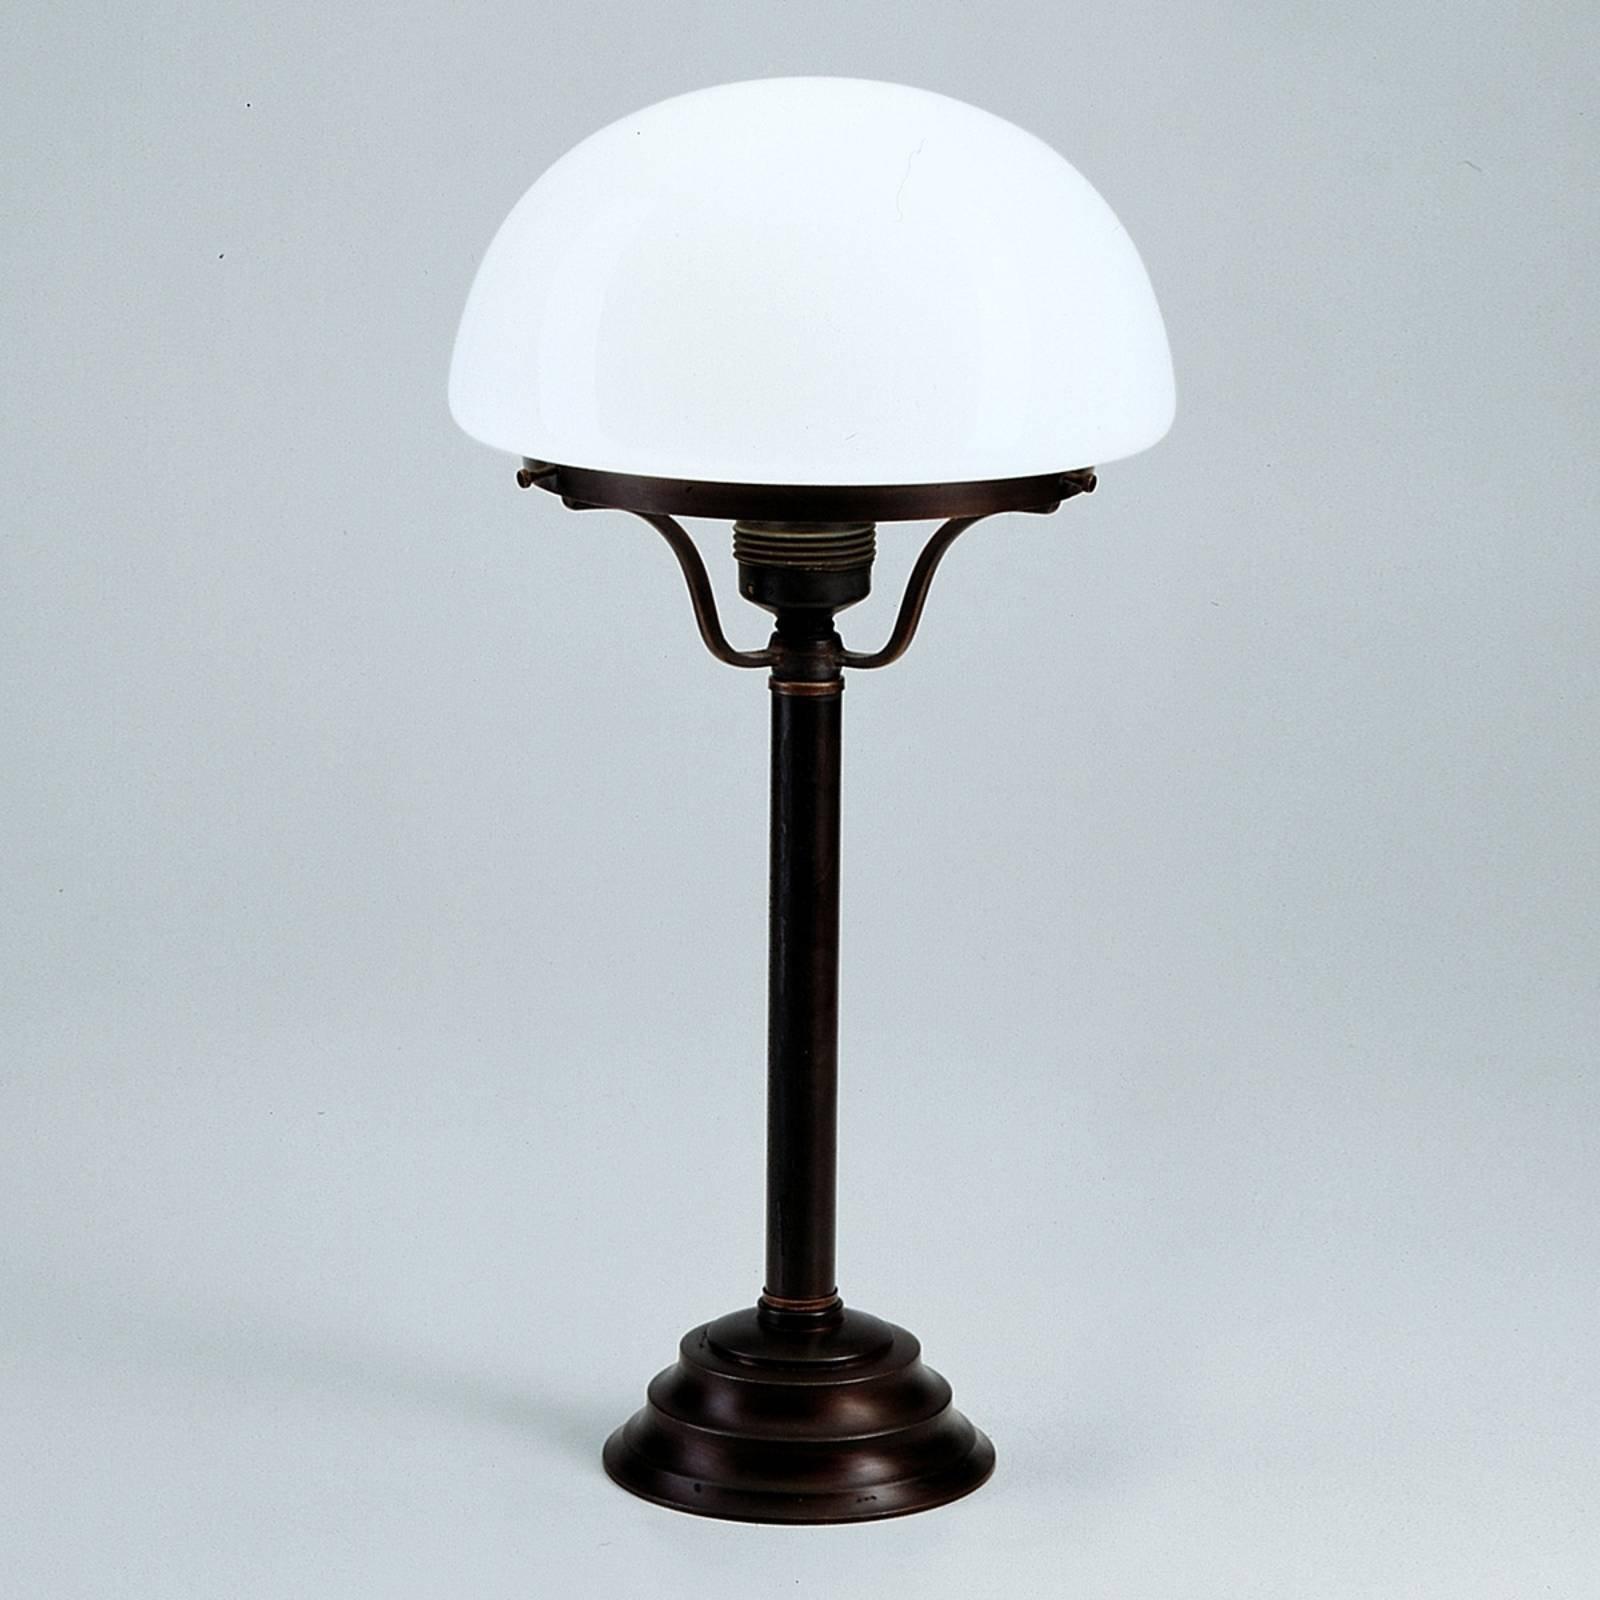 Bordlampe Frank med antikt utseende